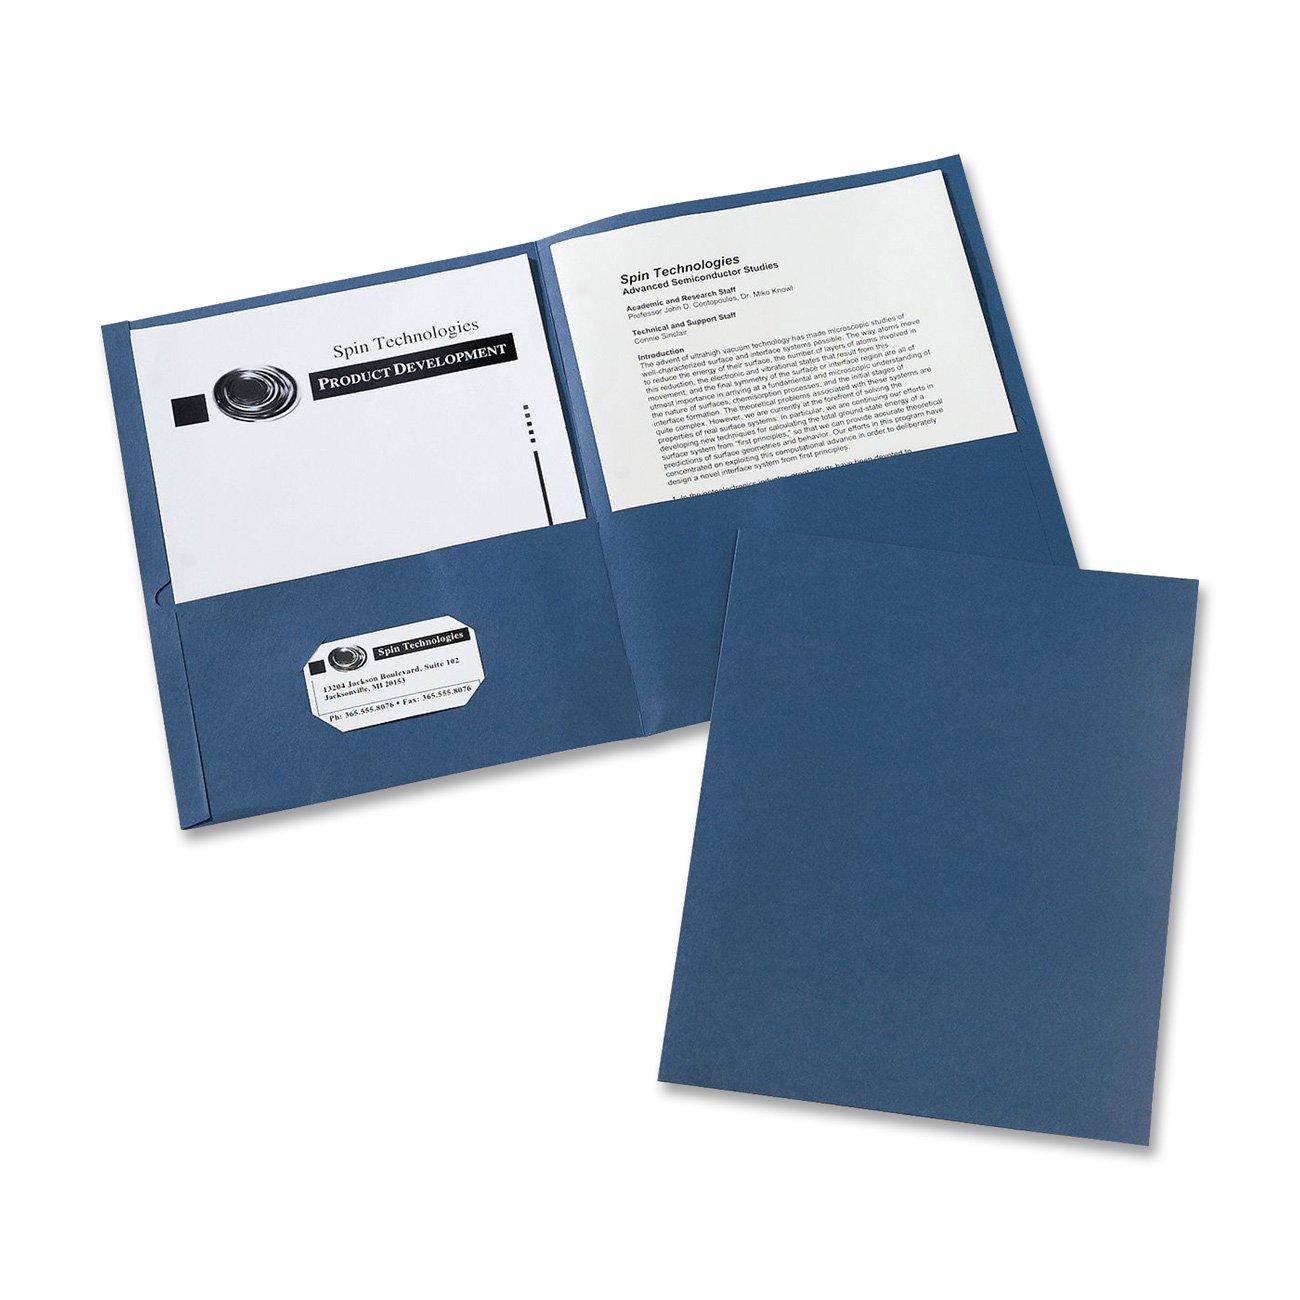 Amazon.com : Avery Two-Pocket Folders, Dark Blue, Box of 25 (47985 ...